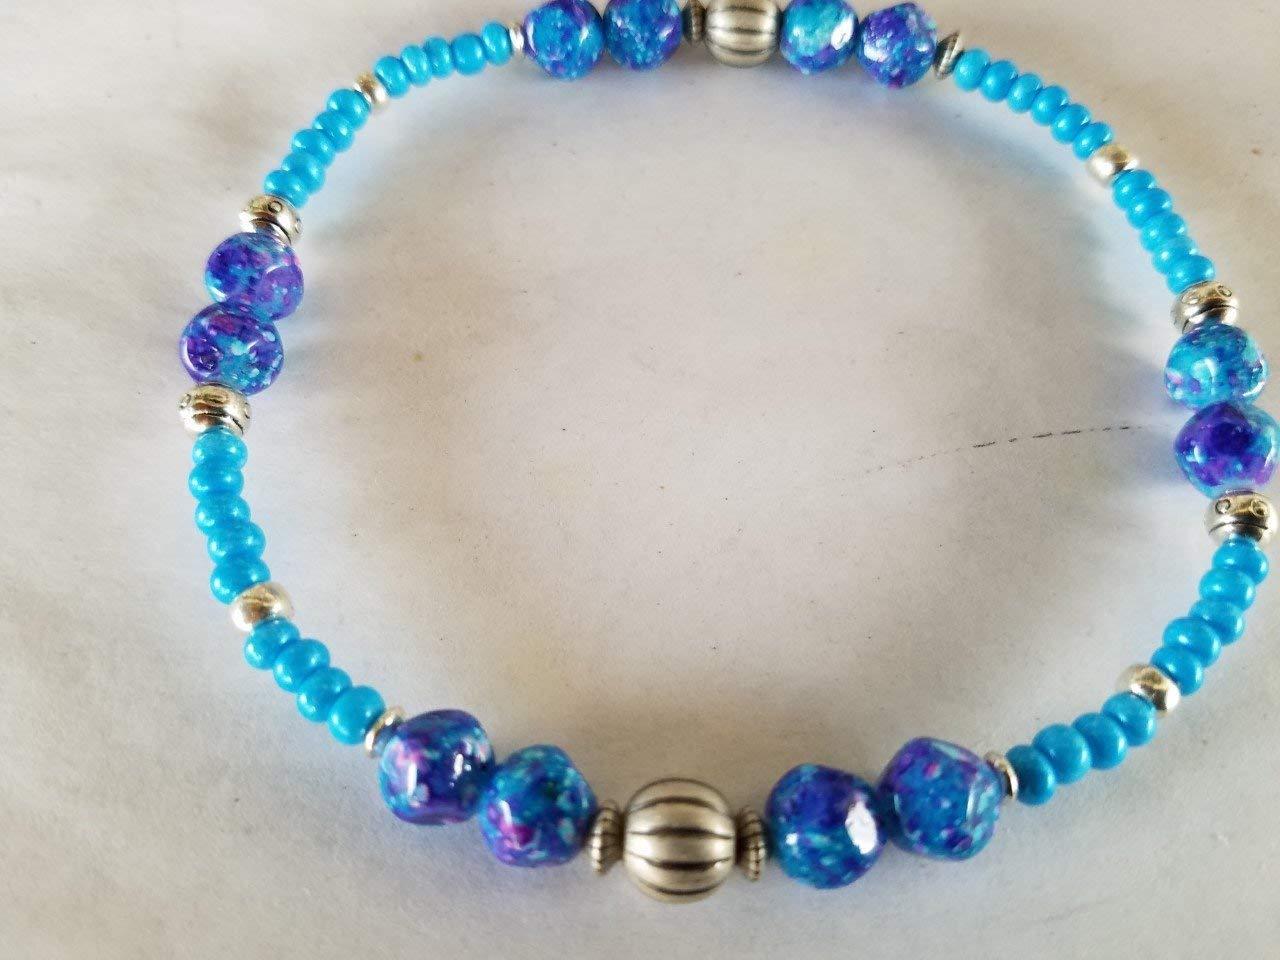 Anklets for Women Beach Anklets Boho Anklet Gemstone Anklets Summer Anklets Ankle Bracelet Faceted Glass Blue Purple White Beads Chic Anklet